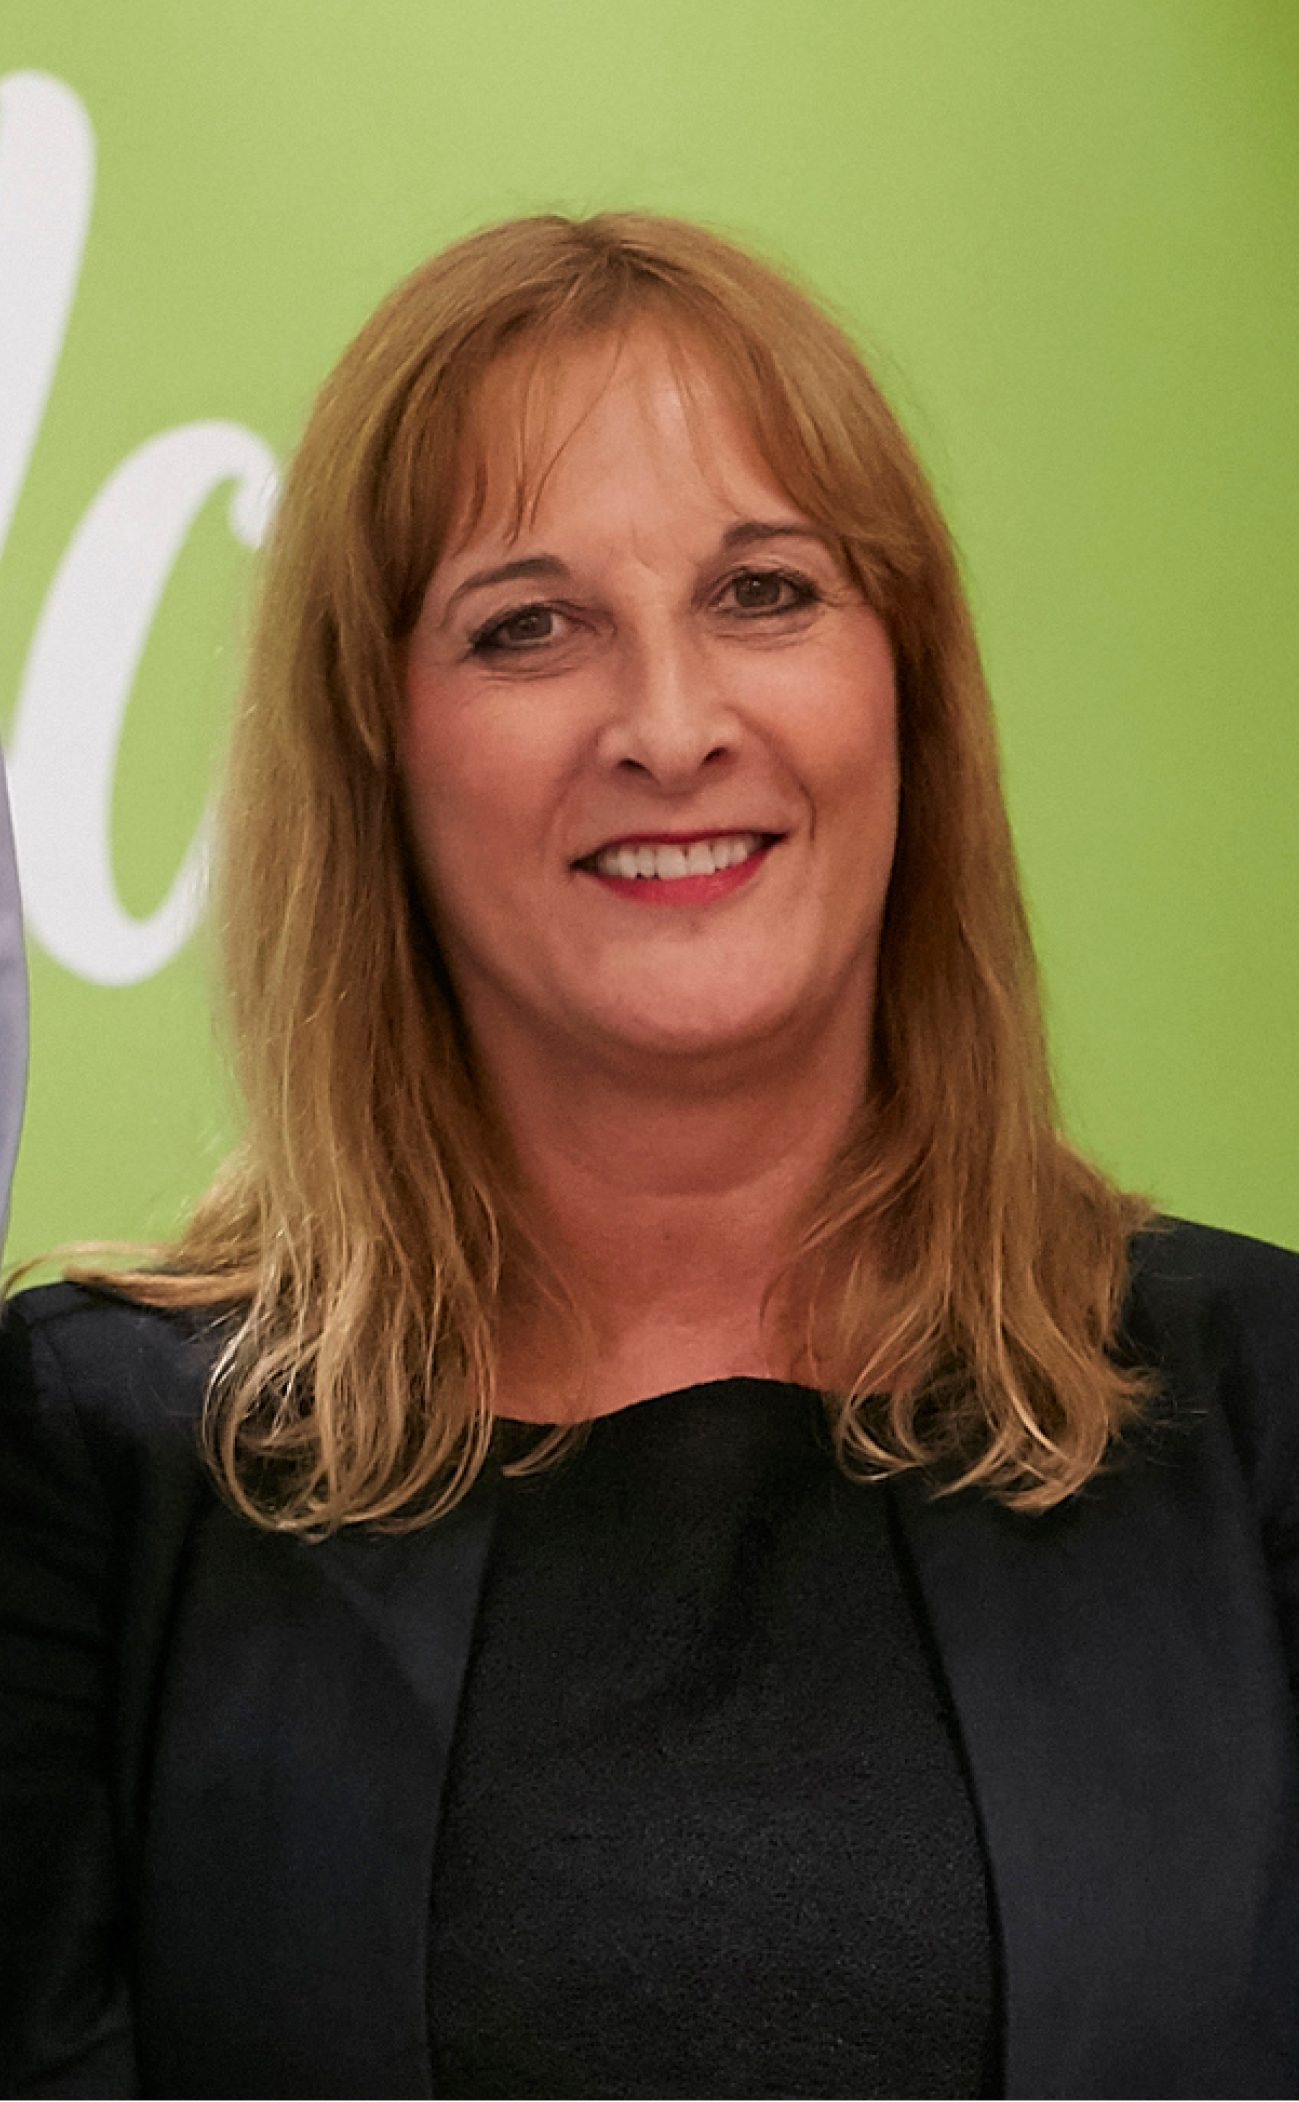 Christine Fox